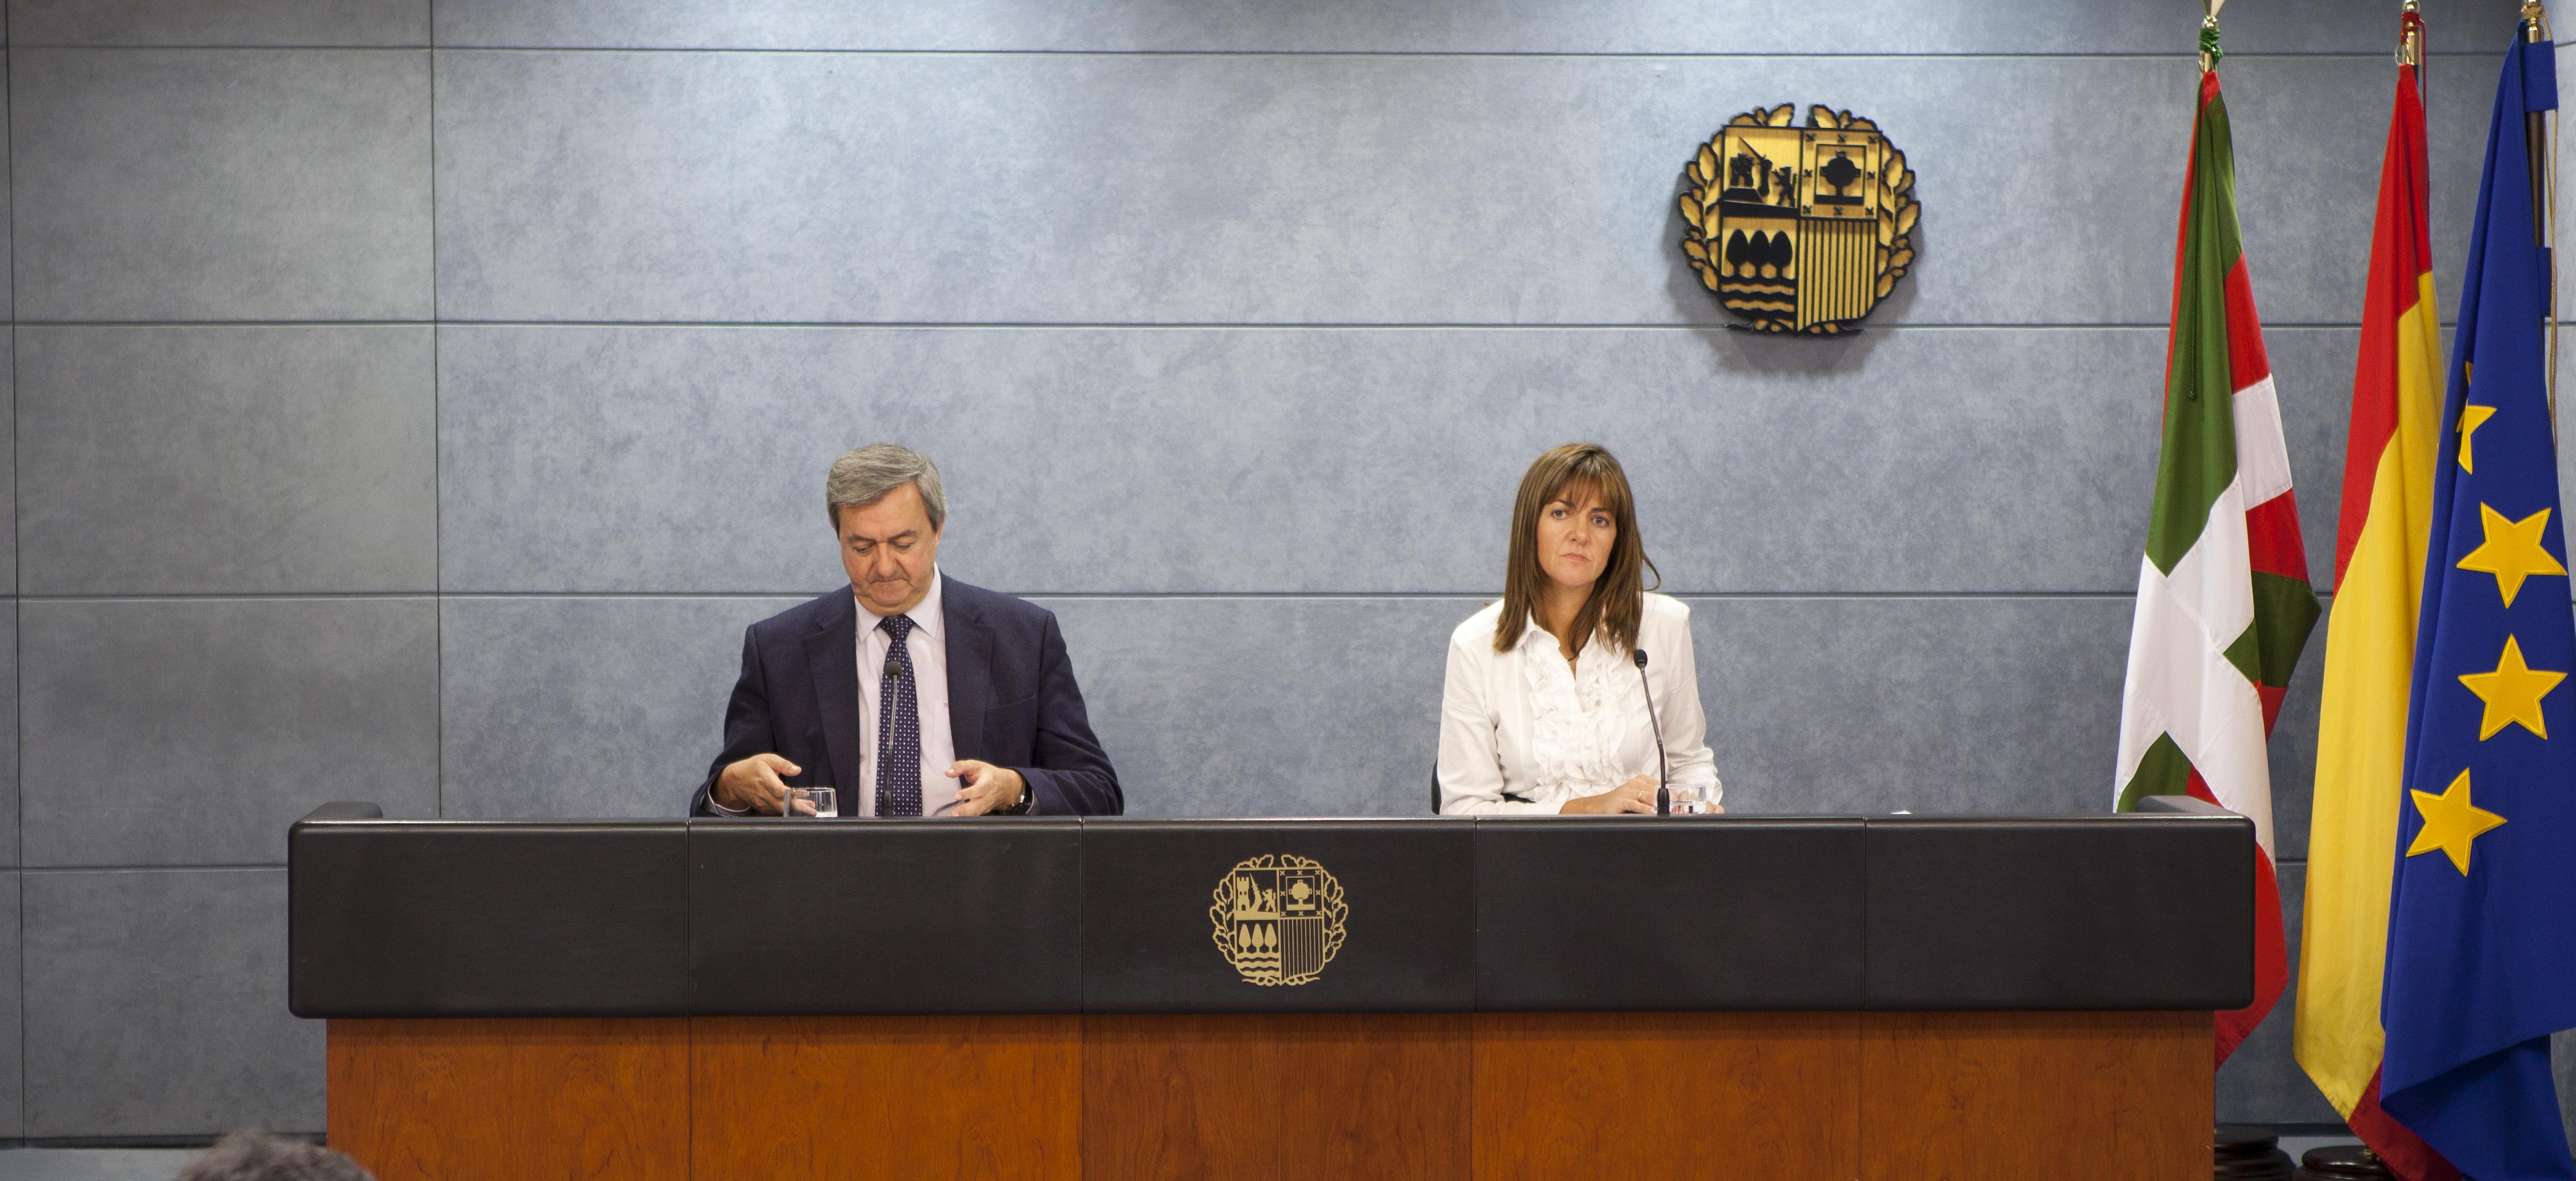 20101109_consejo_gobierno02.jpg